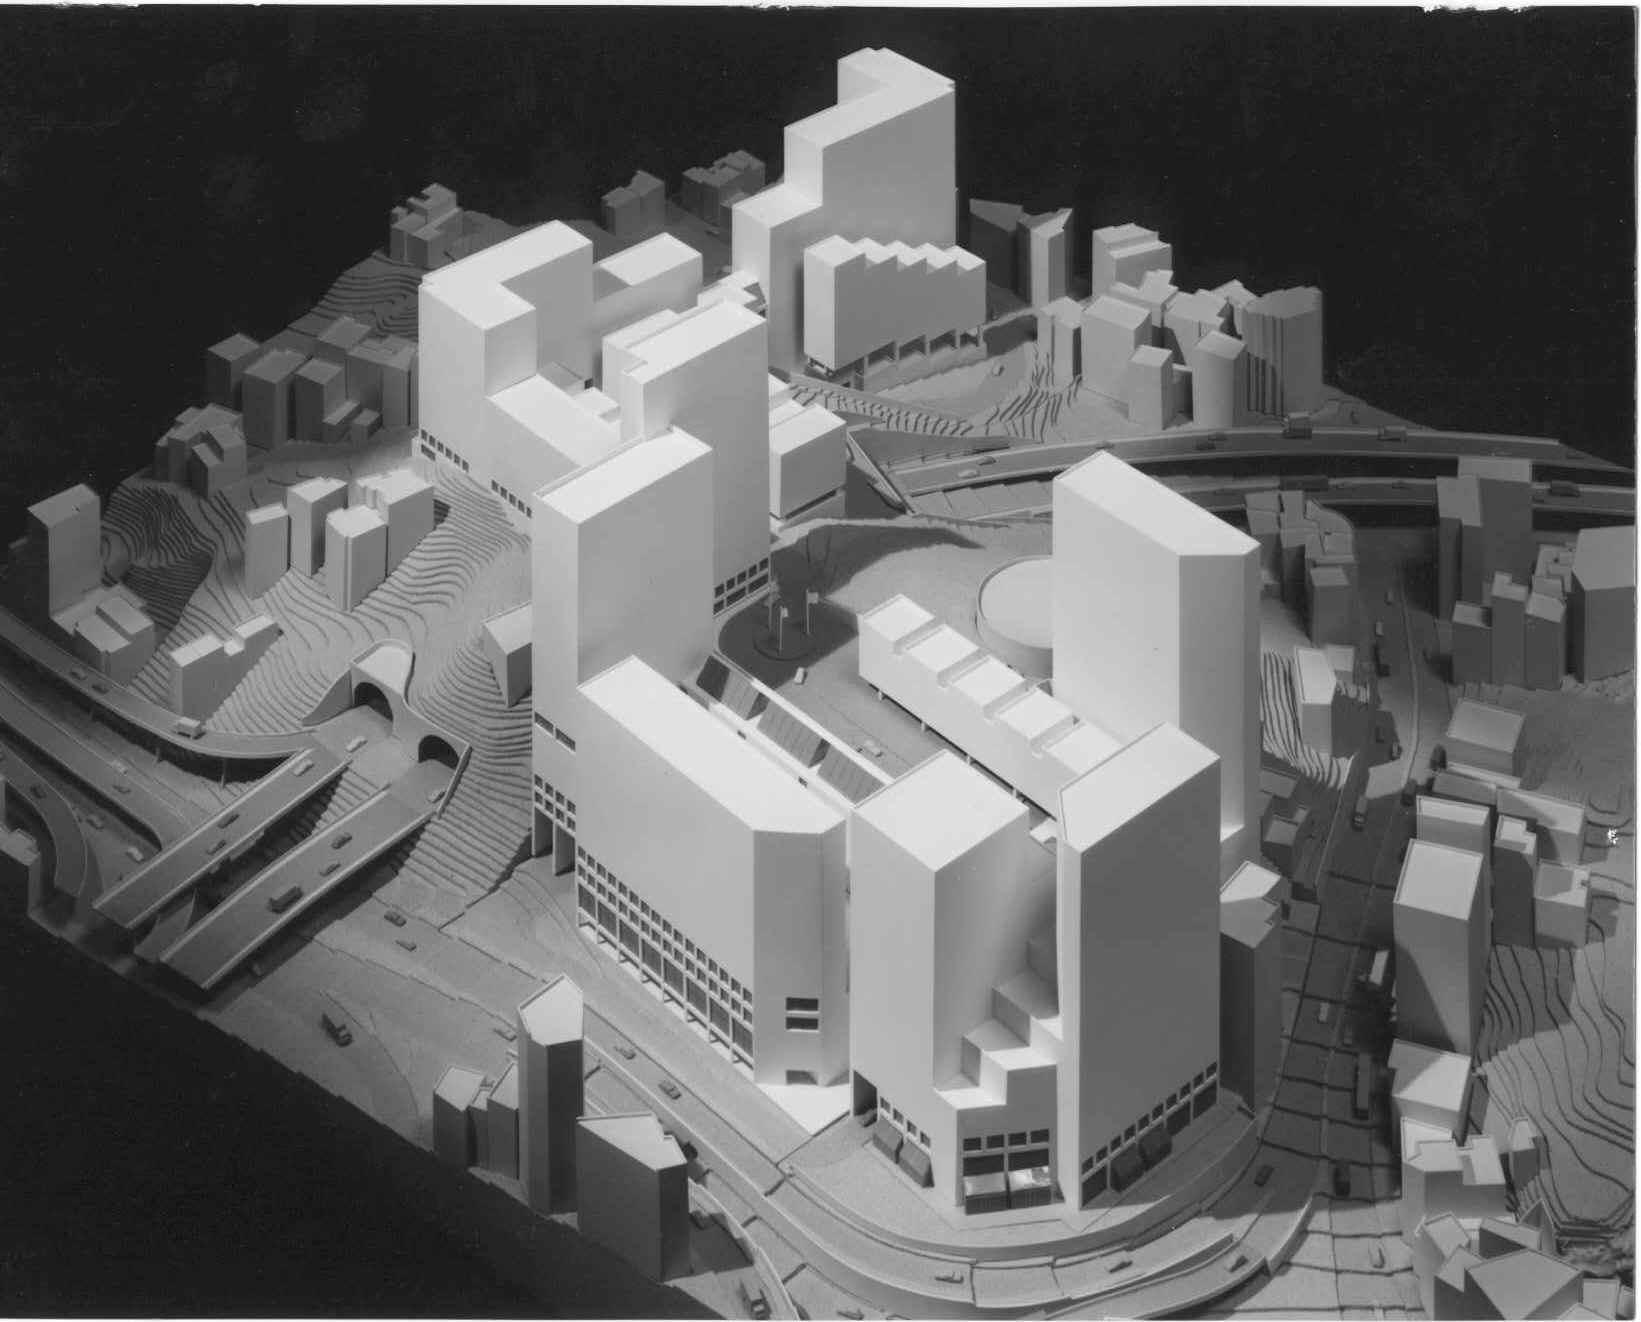 architectural-site-model-5.jpg